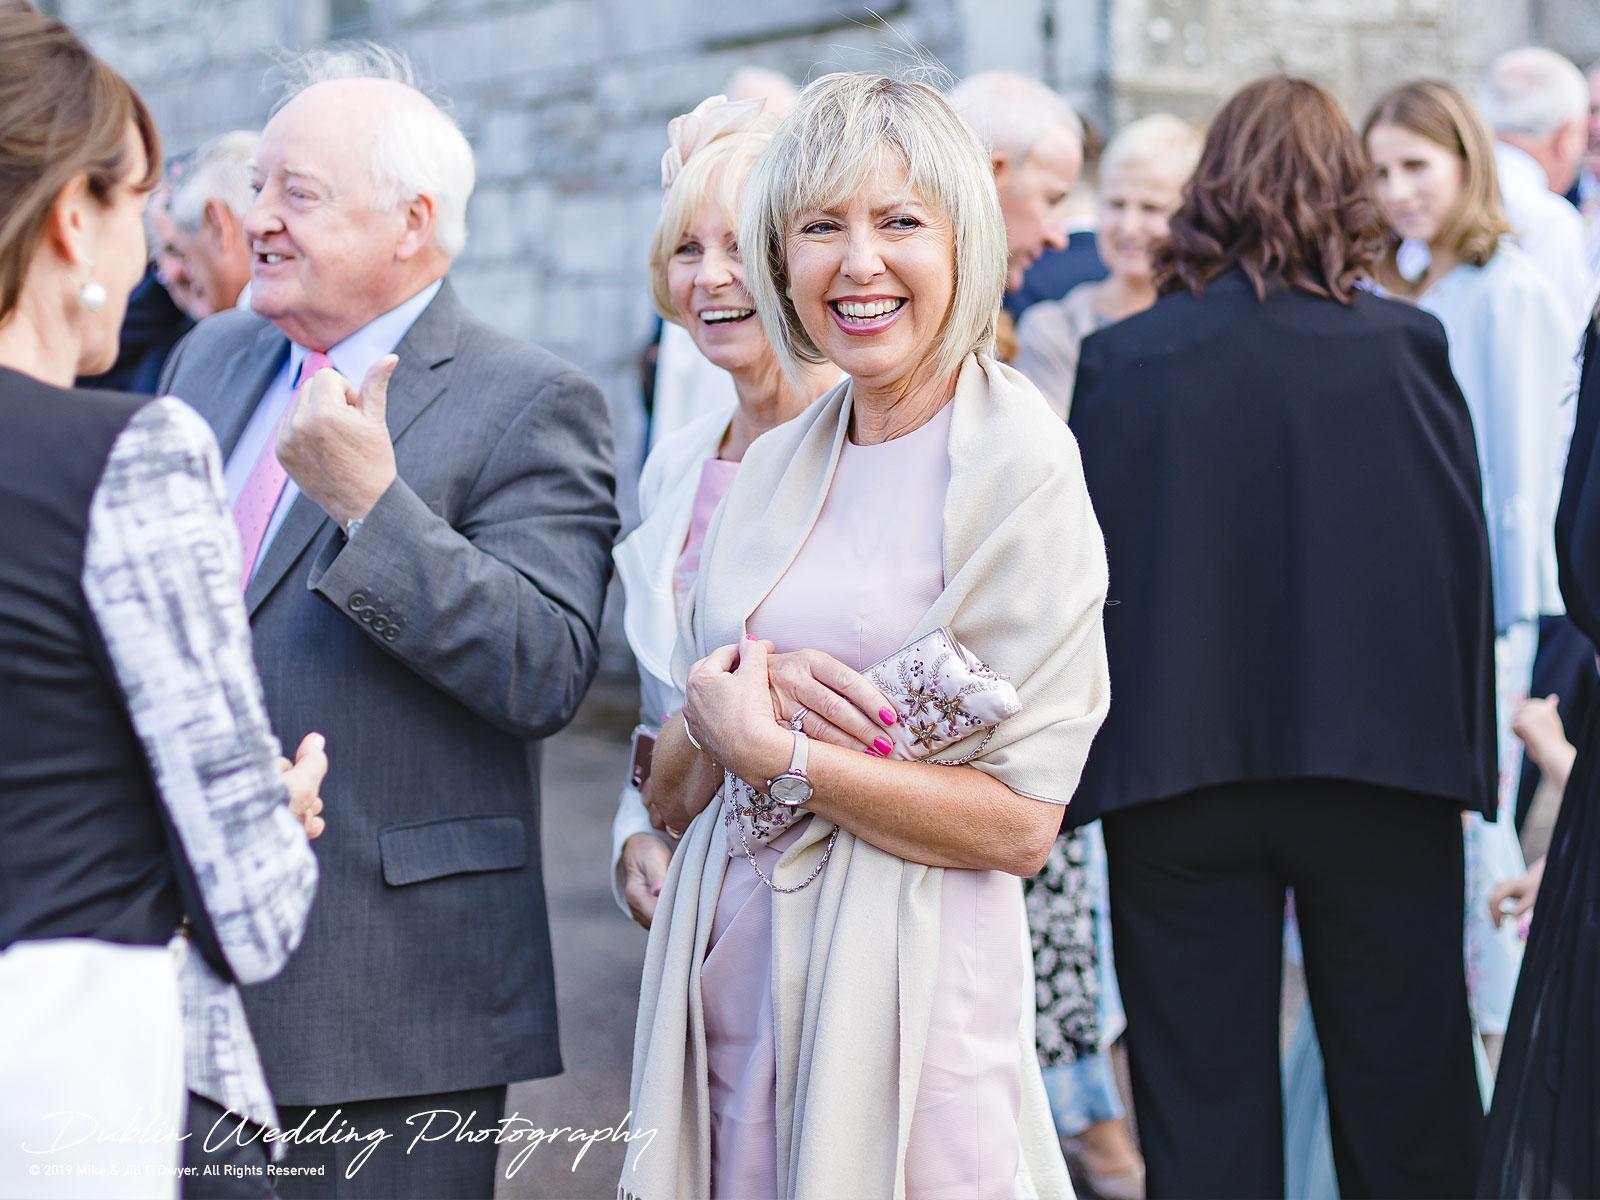 wedding-photographers-wicklow-tinakilly-house-2019-31.jpg